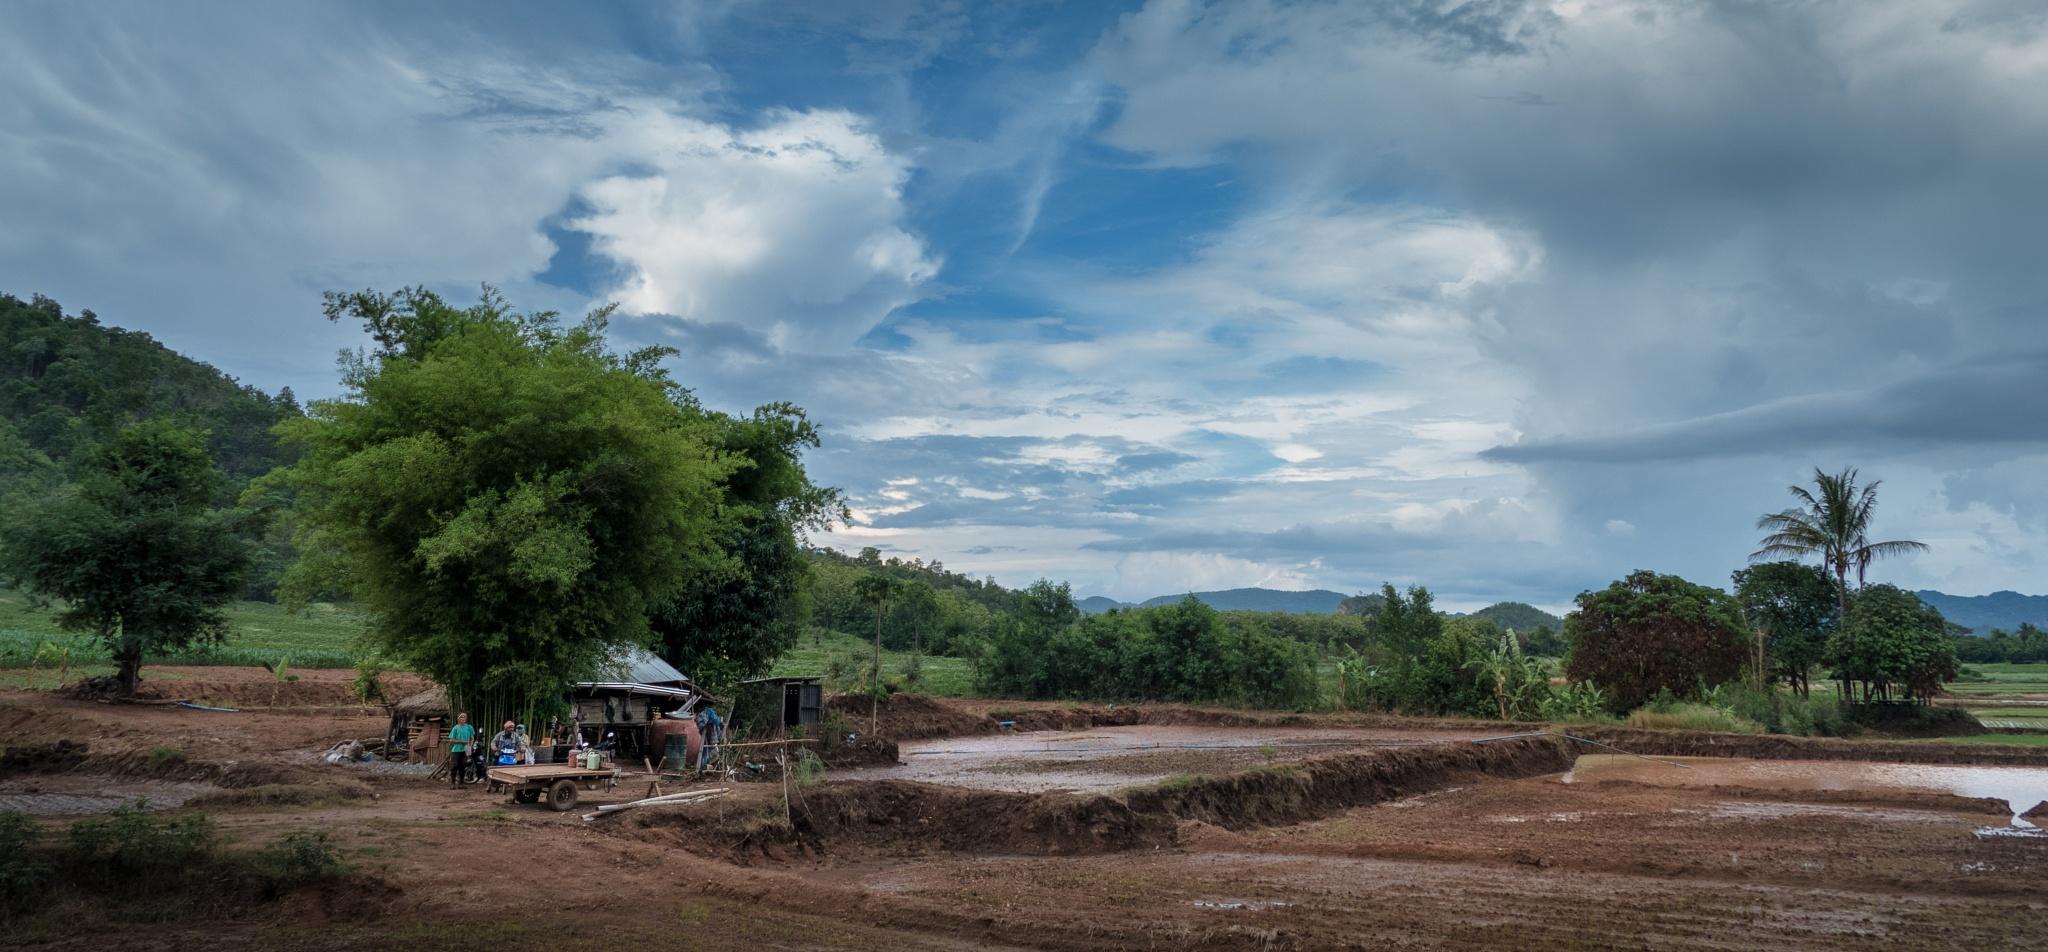 Preparing the rice fields by steve56